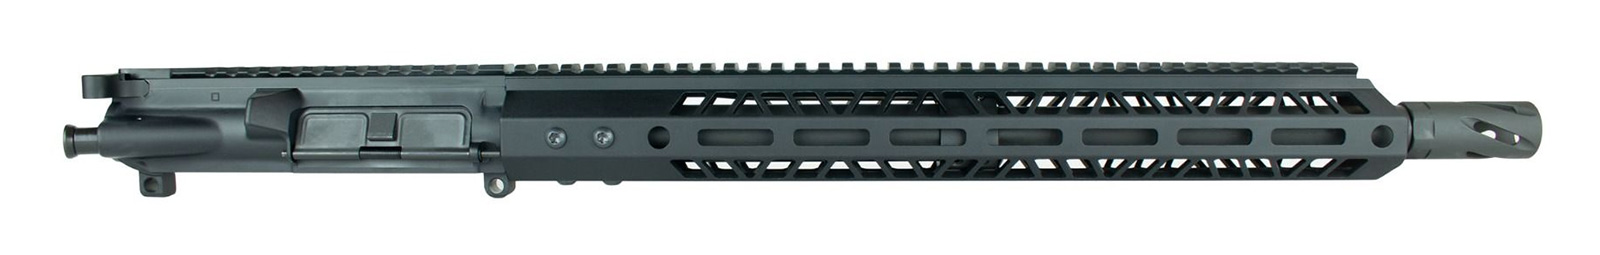 ar15-complete-upper-assembly-16-inch-450-bushmaster-124-m-lok-160011